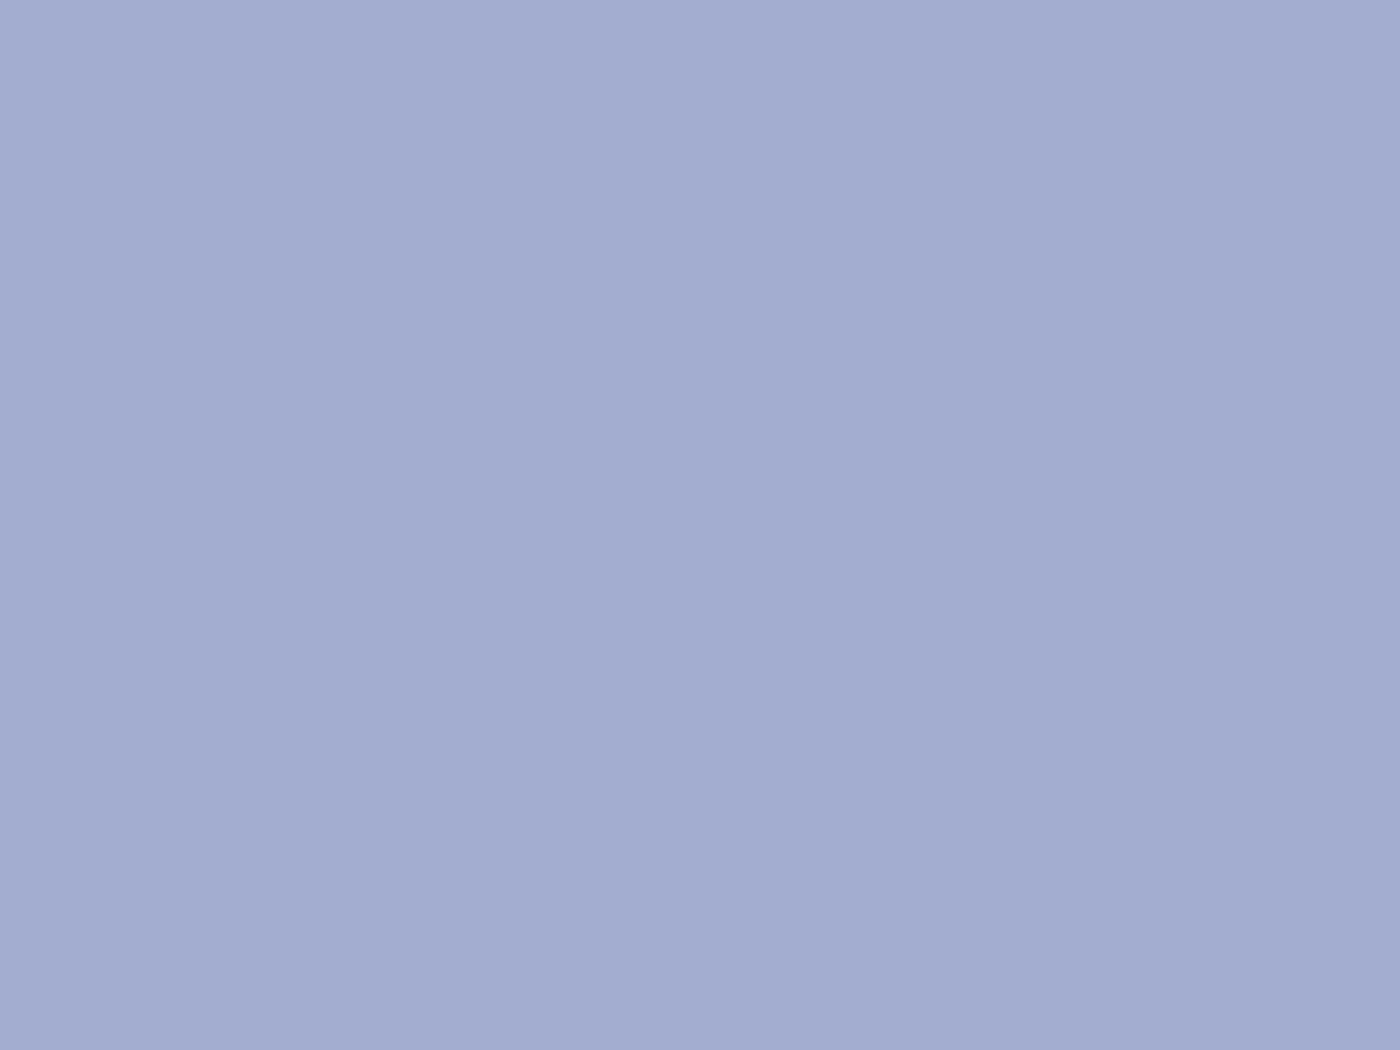 1400x1050 Wild Blue Yonder Solid Color Background